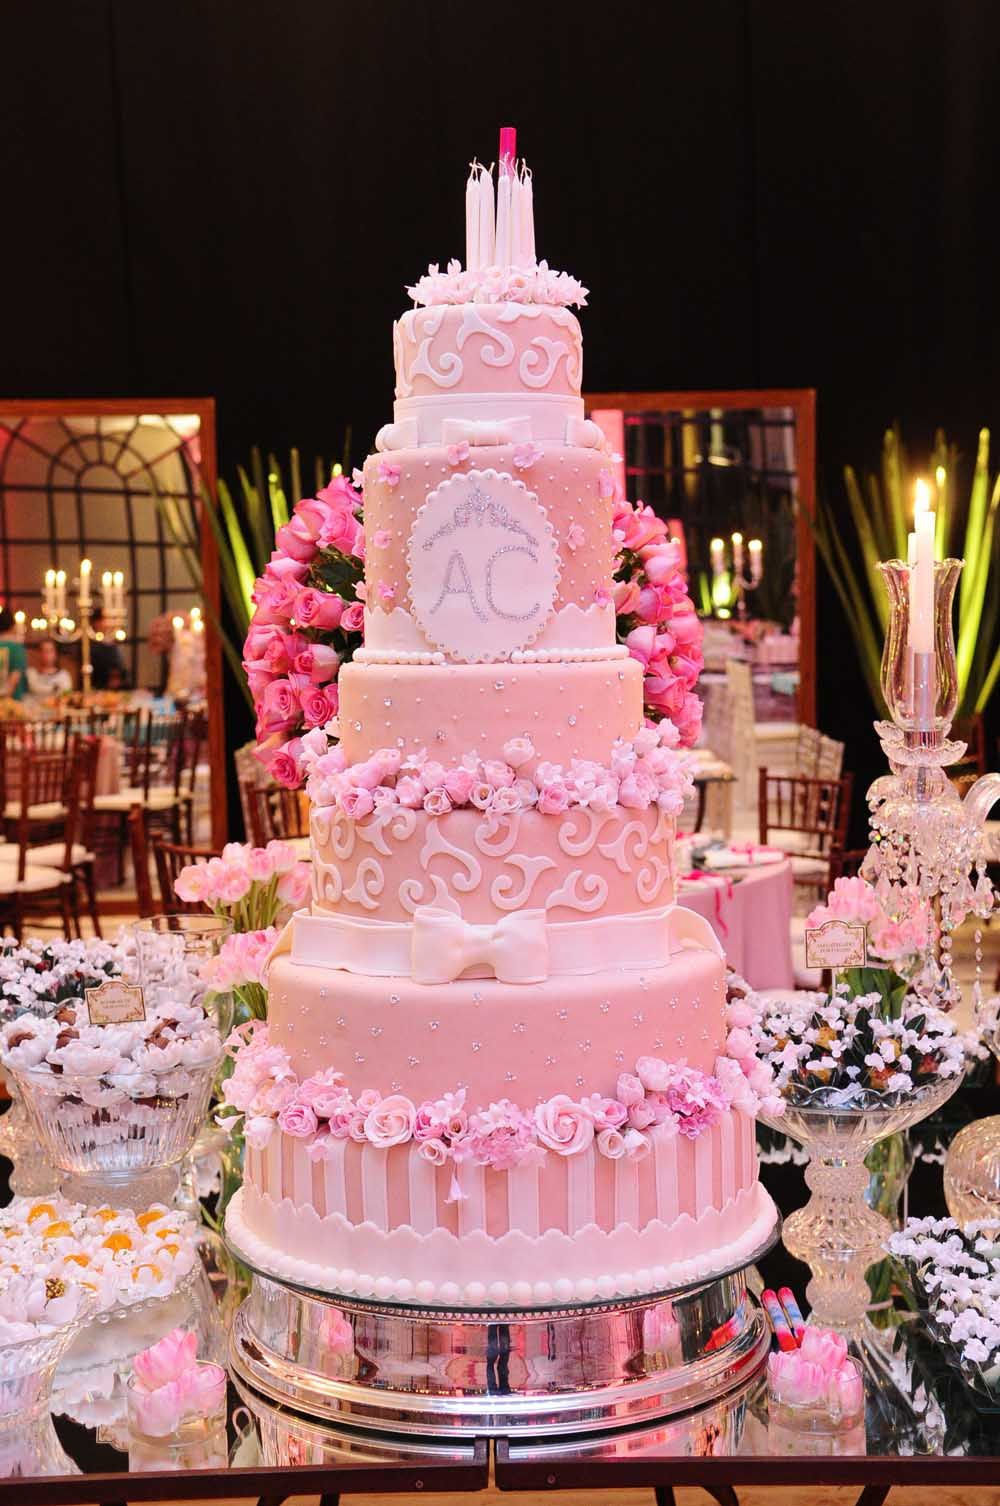 festa alice 15 anos - Pesquisa Google | Cake and decorations ...